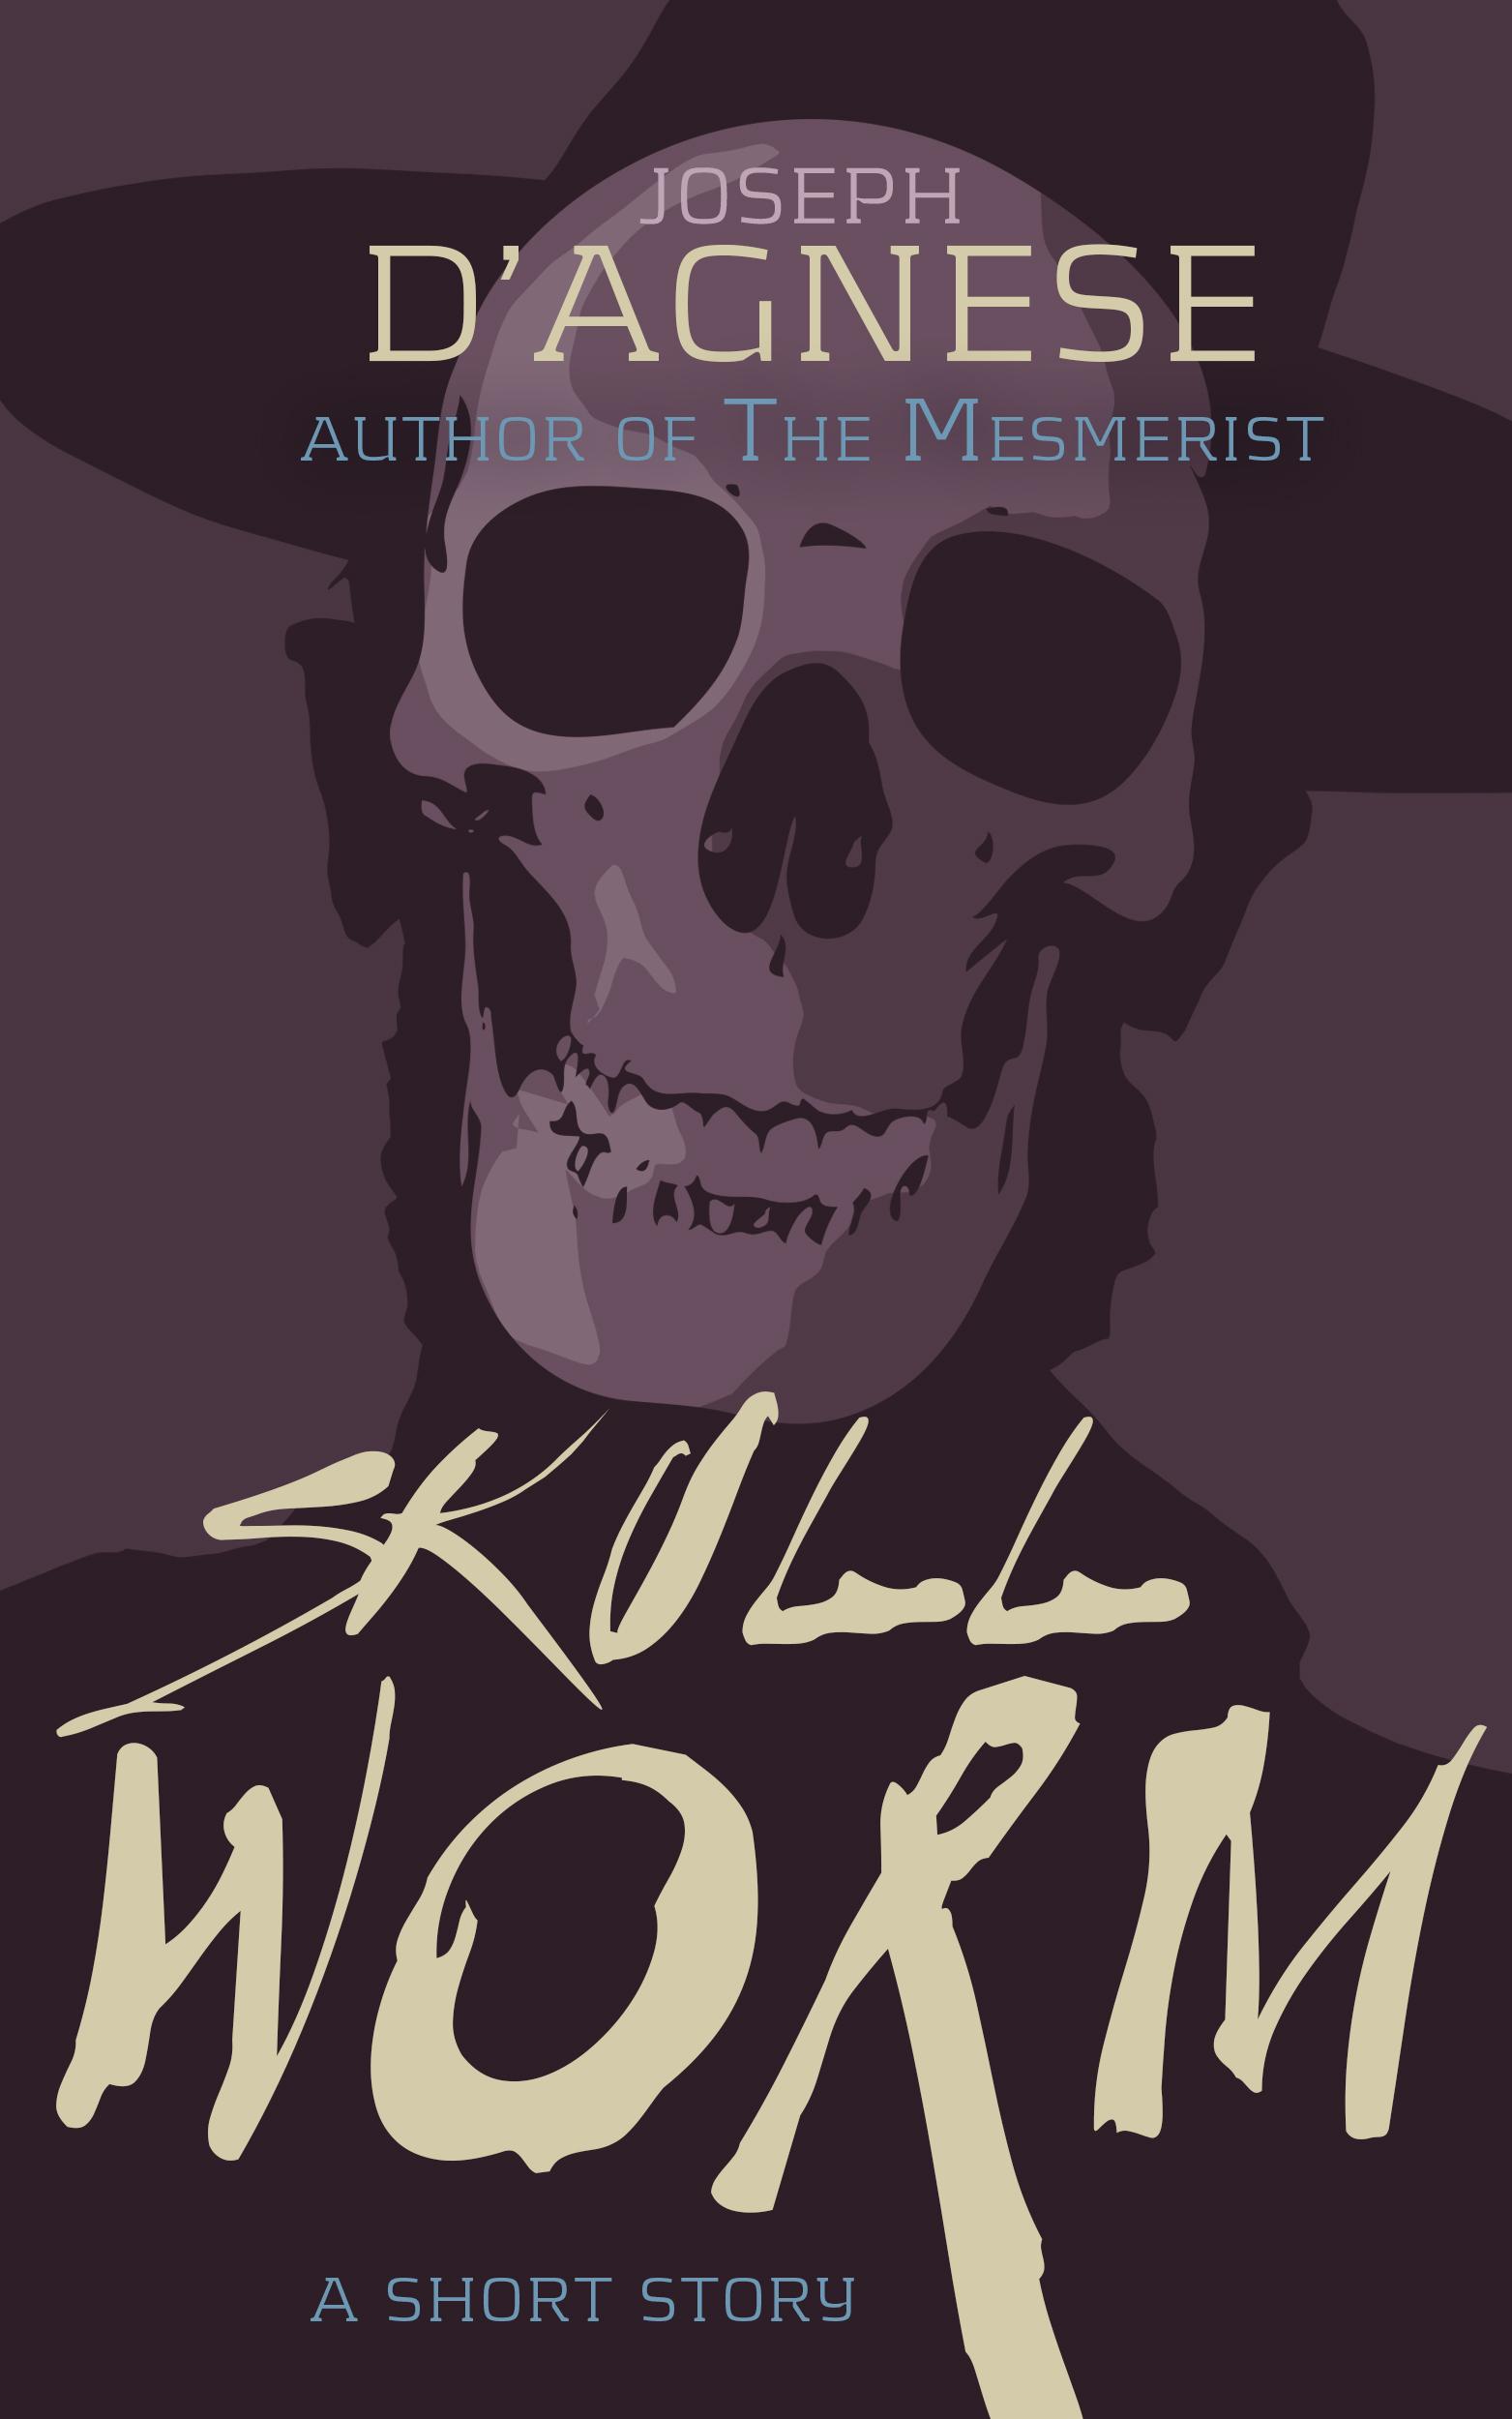 Skullworm by Joseph D'Agnese